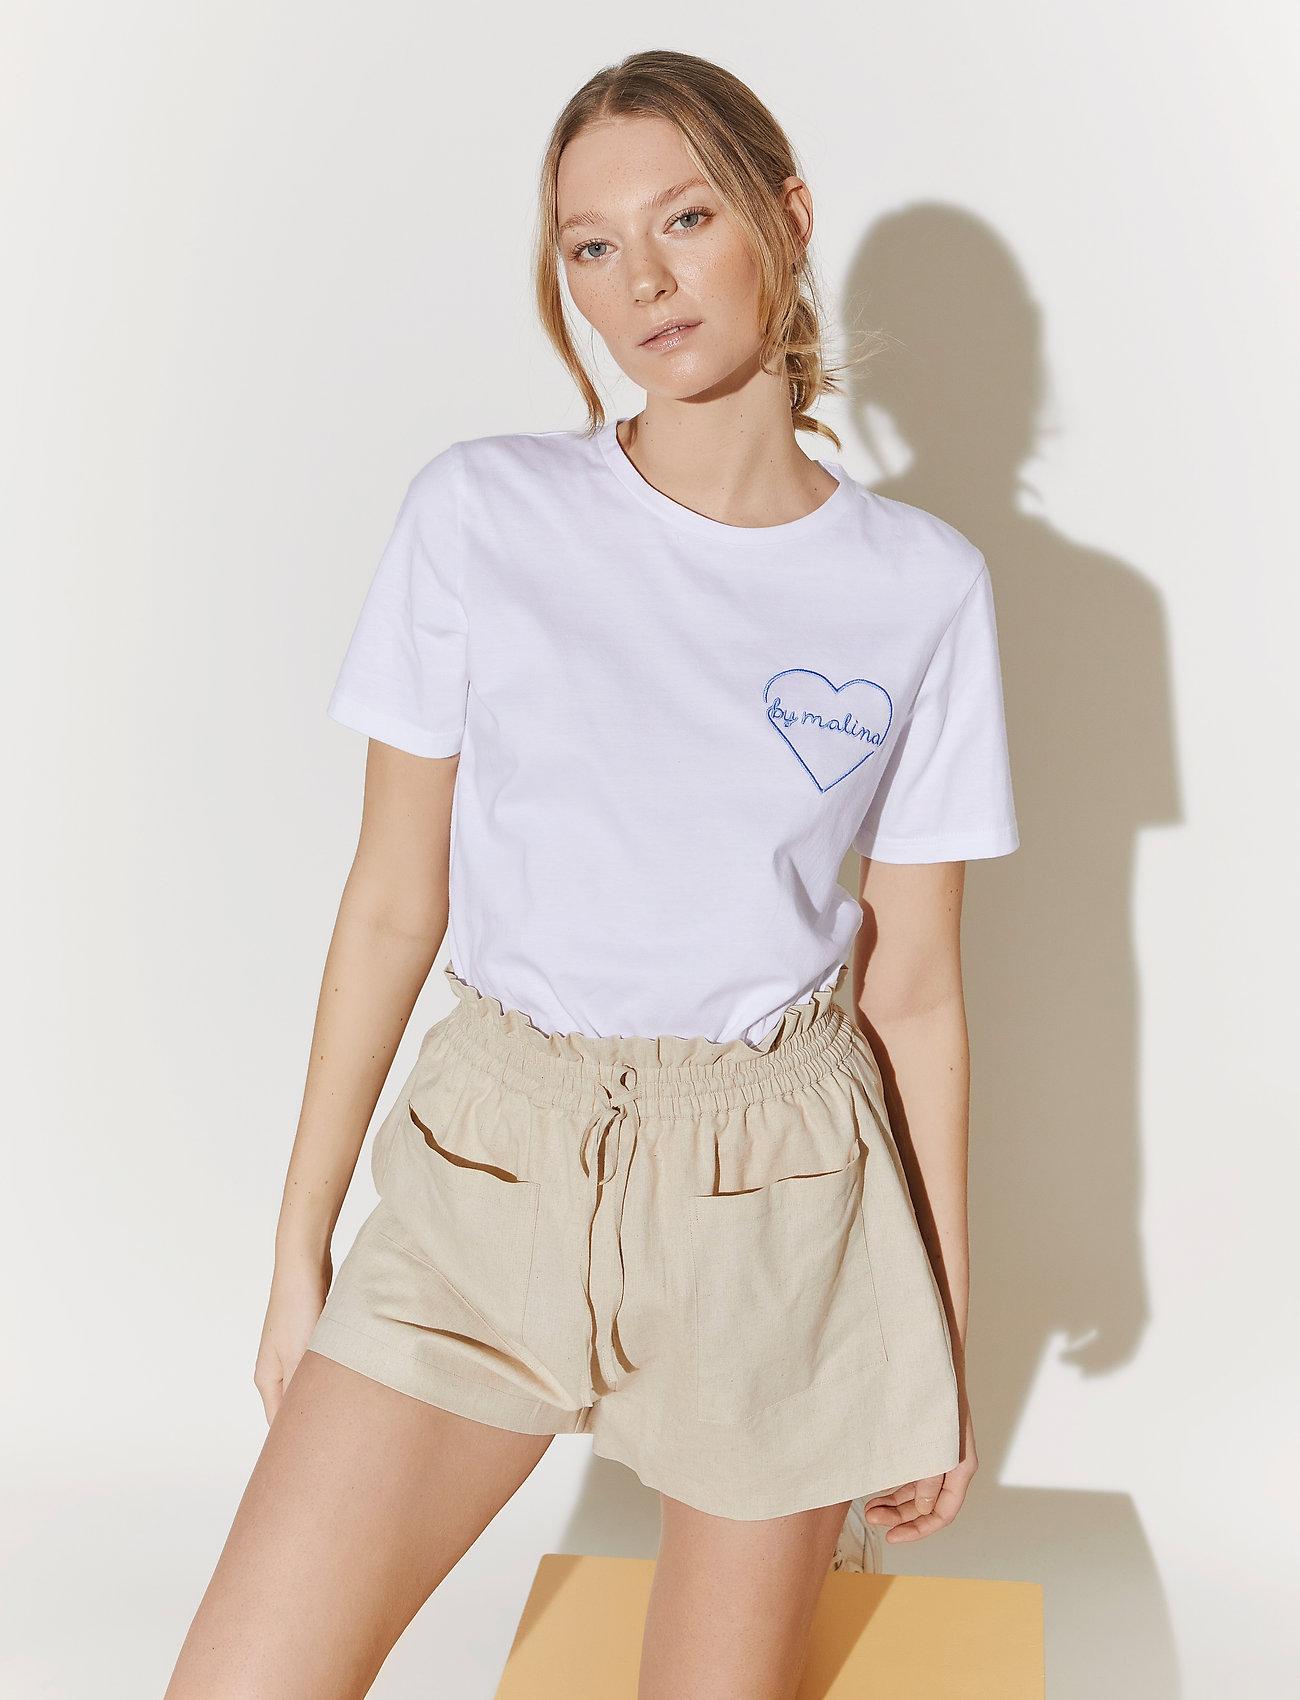 By Malina - Darling tee - t-shirts - white - 0